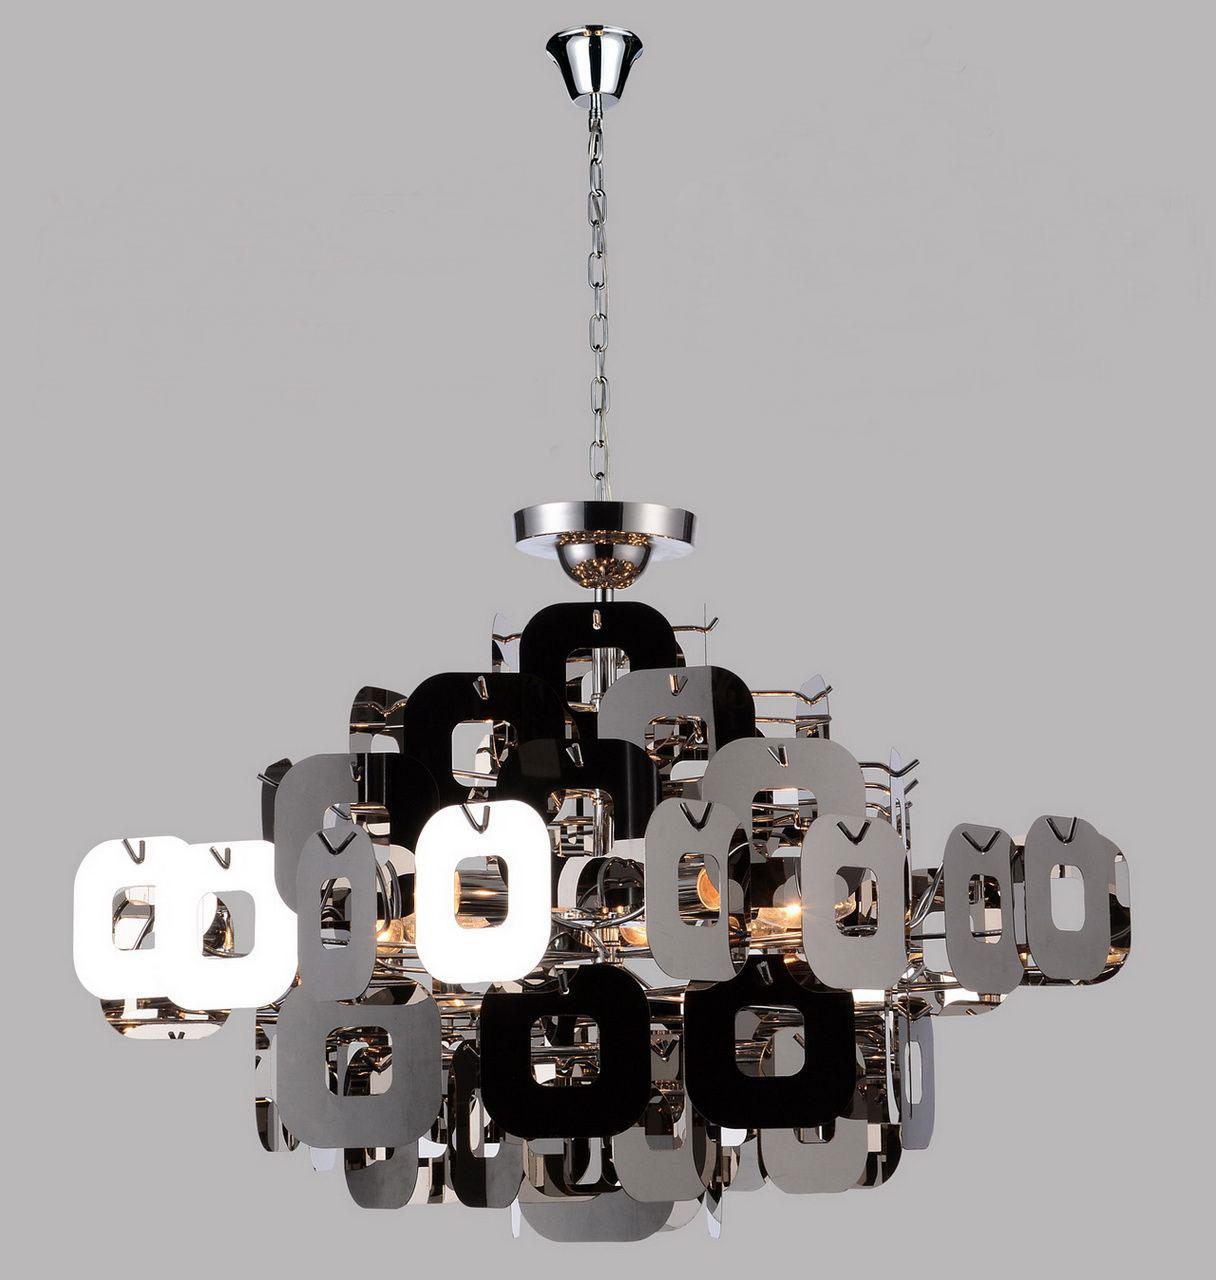 Люстра подвесная Favourite Chromic-pieces, 6 х E14, 40W. 1425-6PC1425-6PC